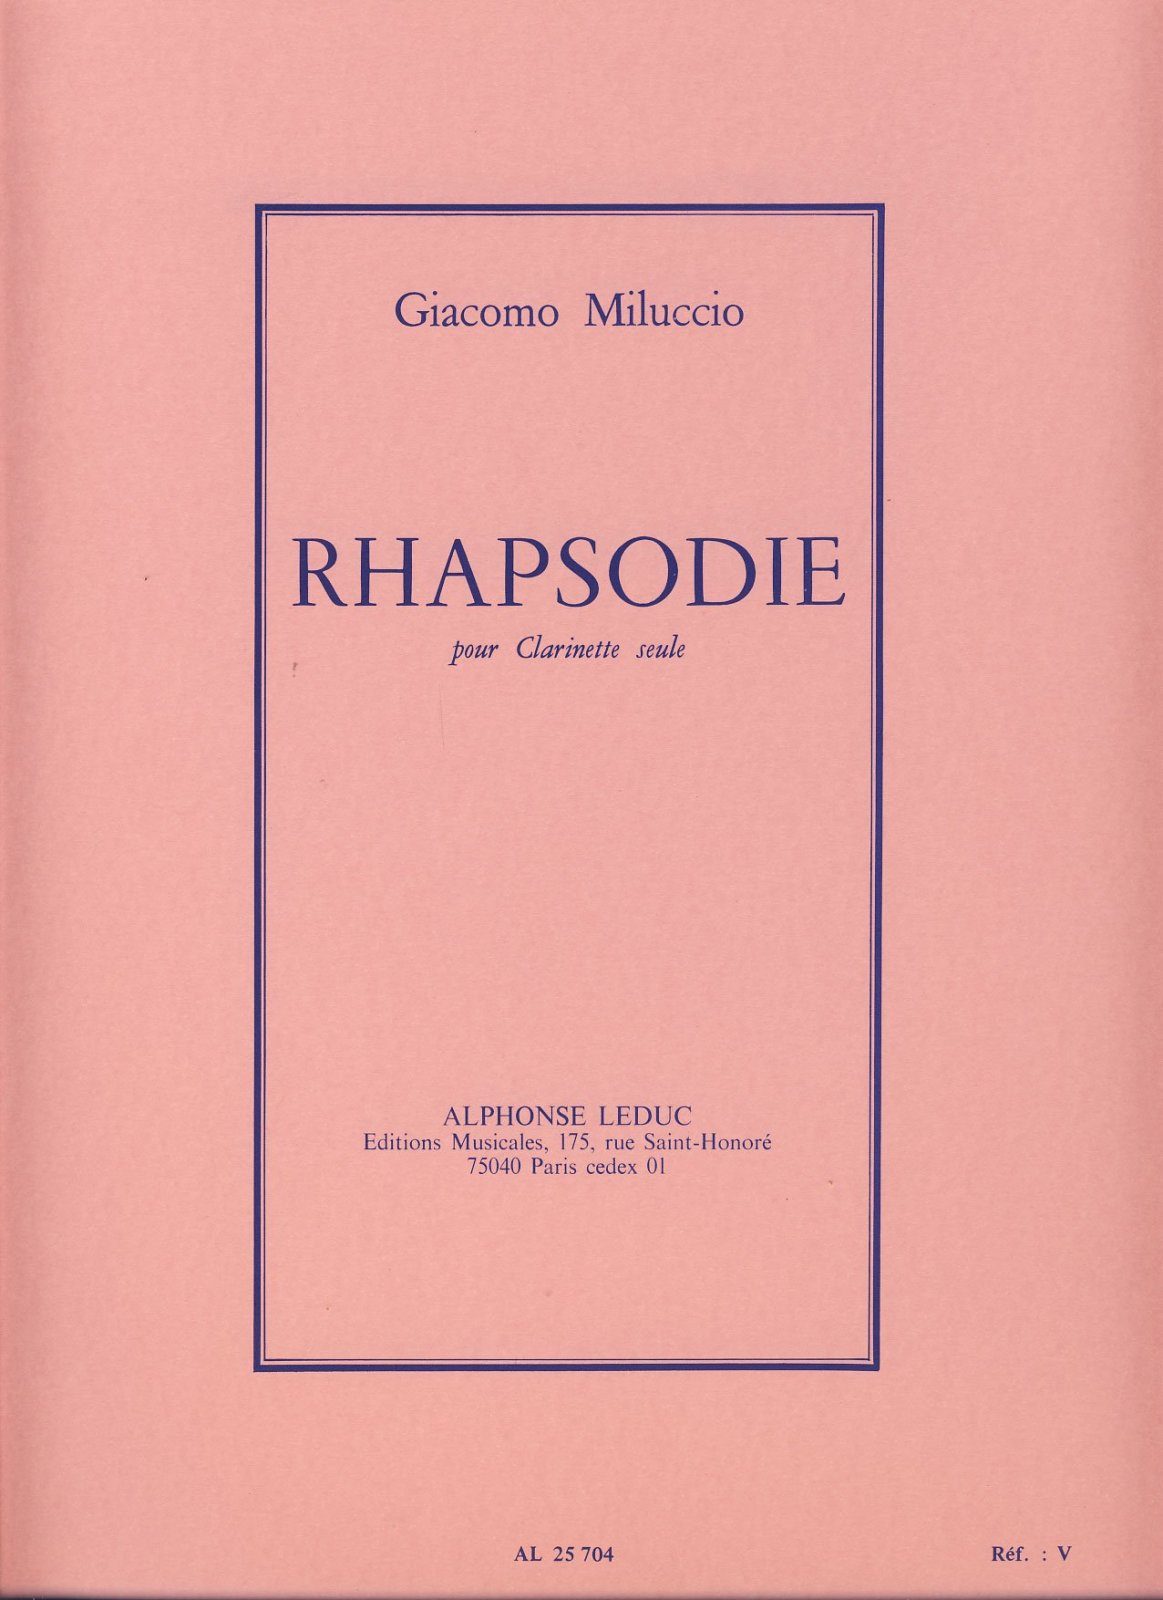 Miluccio, Giacomo: Rhapsodie for Clarinet Solo